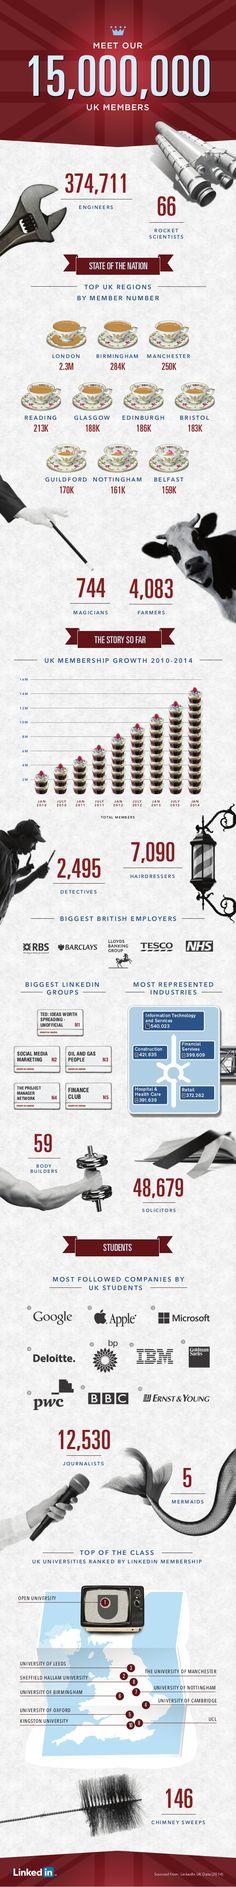 15 Million Members in UK from LinkedIn  #Infographic #Linkedin #UK